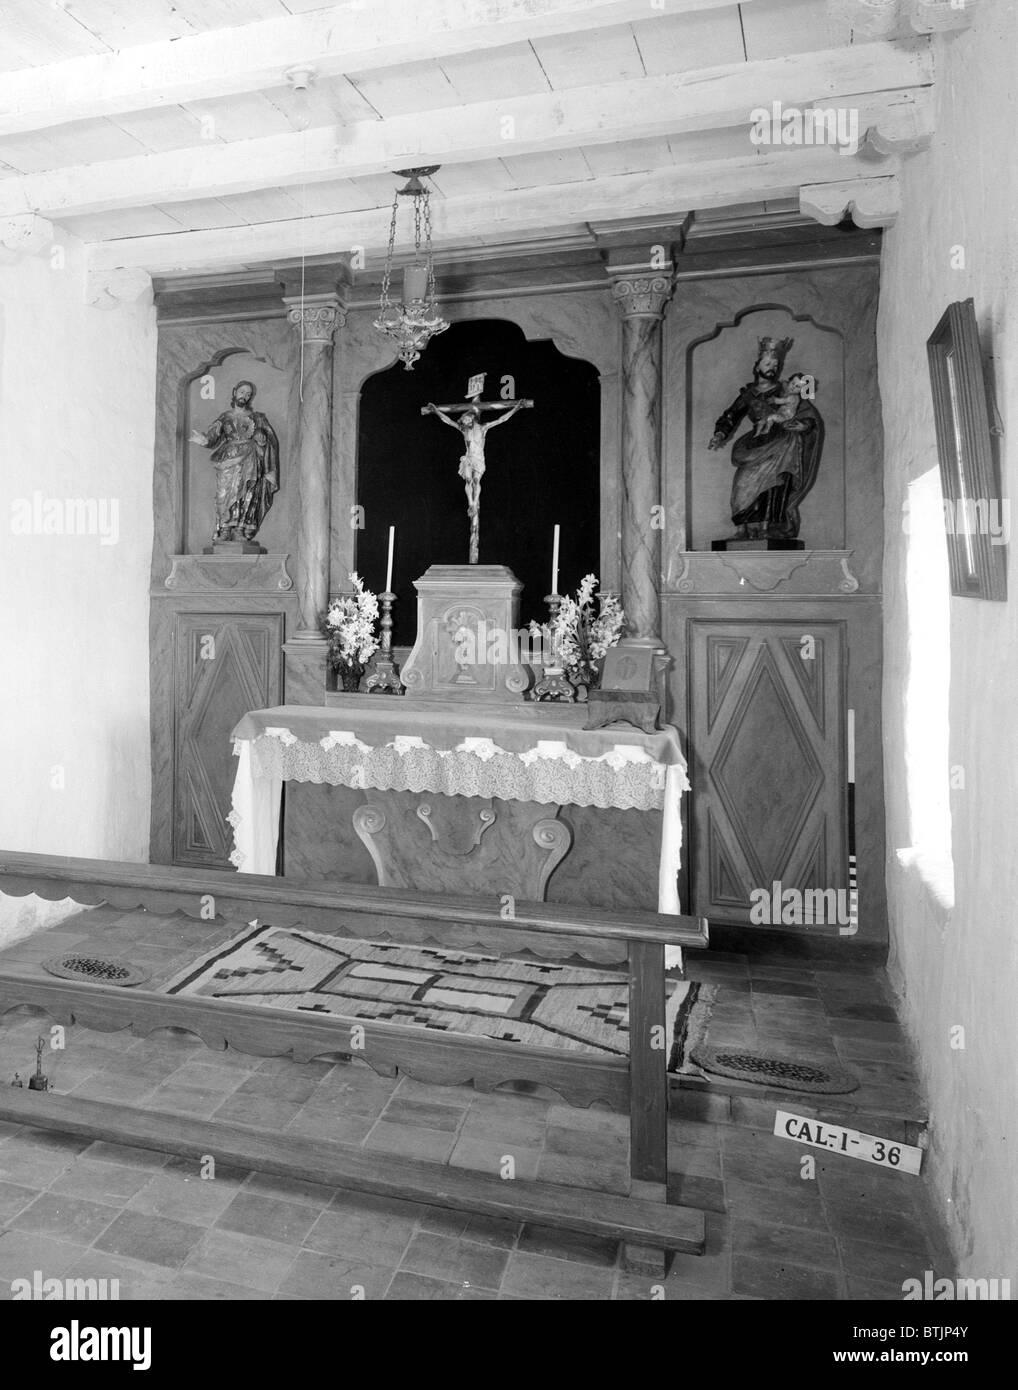 Religion, Mission San Carlos Borromeo, detail of small chapel, photograph by Robert W. Kerrigan, Rio Road, & - Stock Image